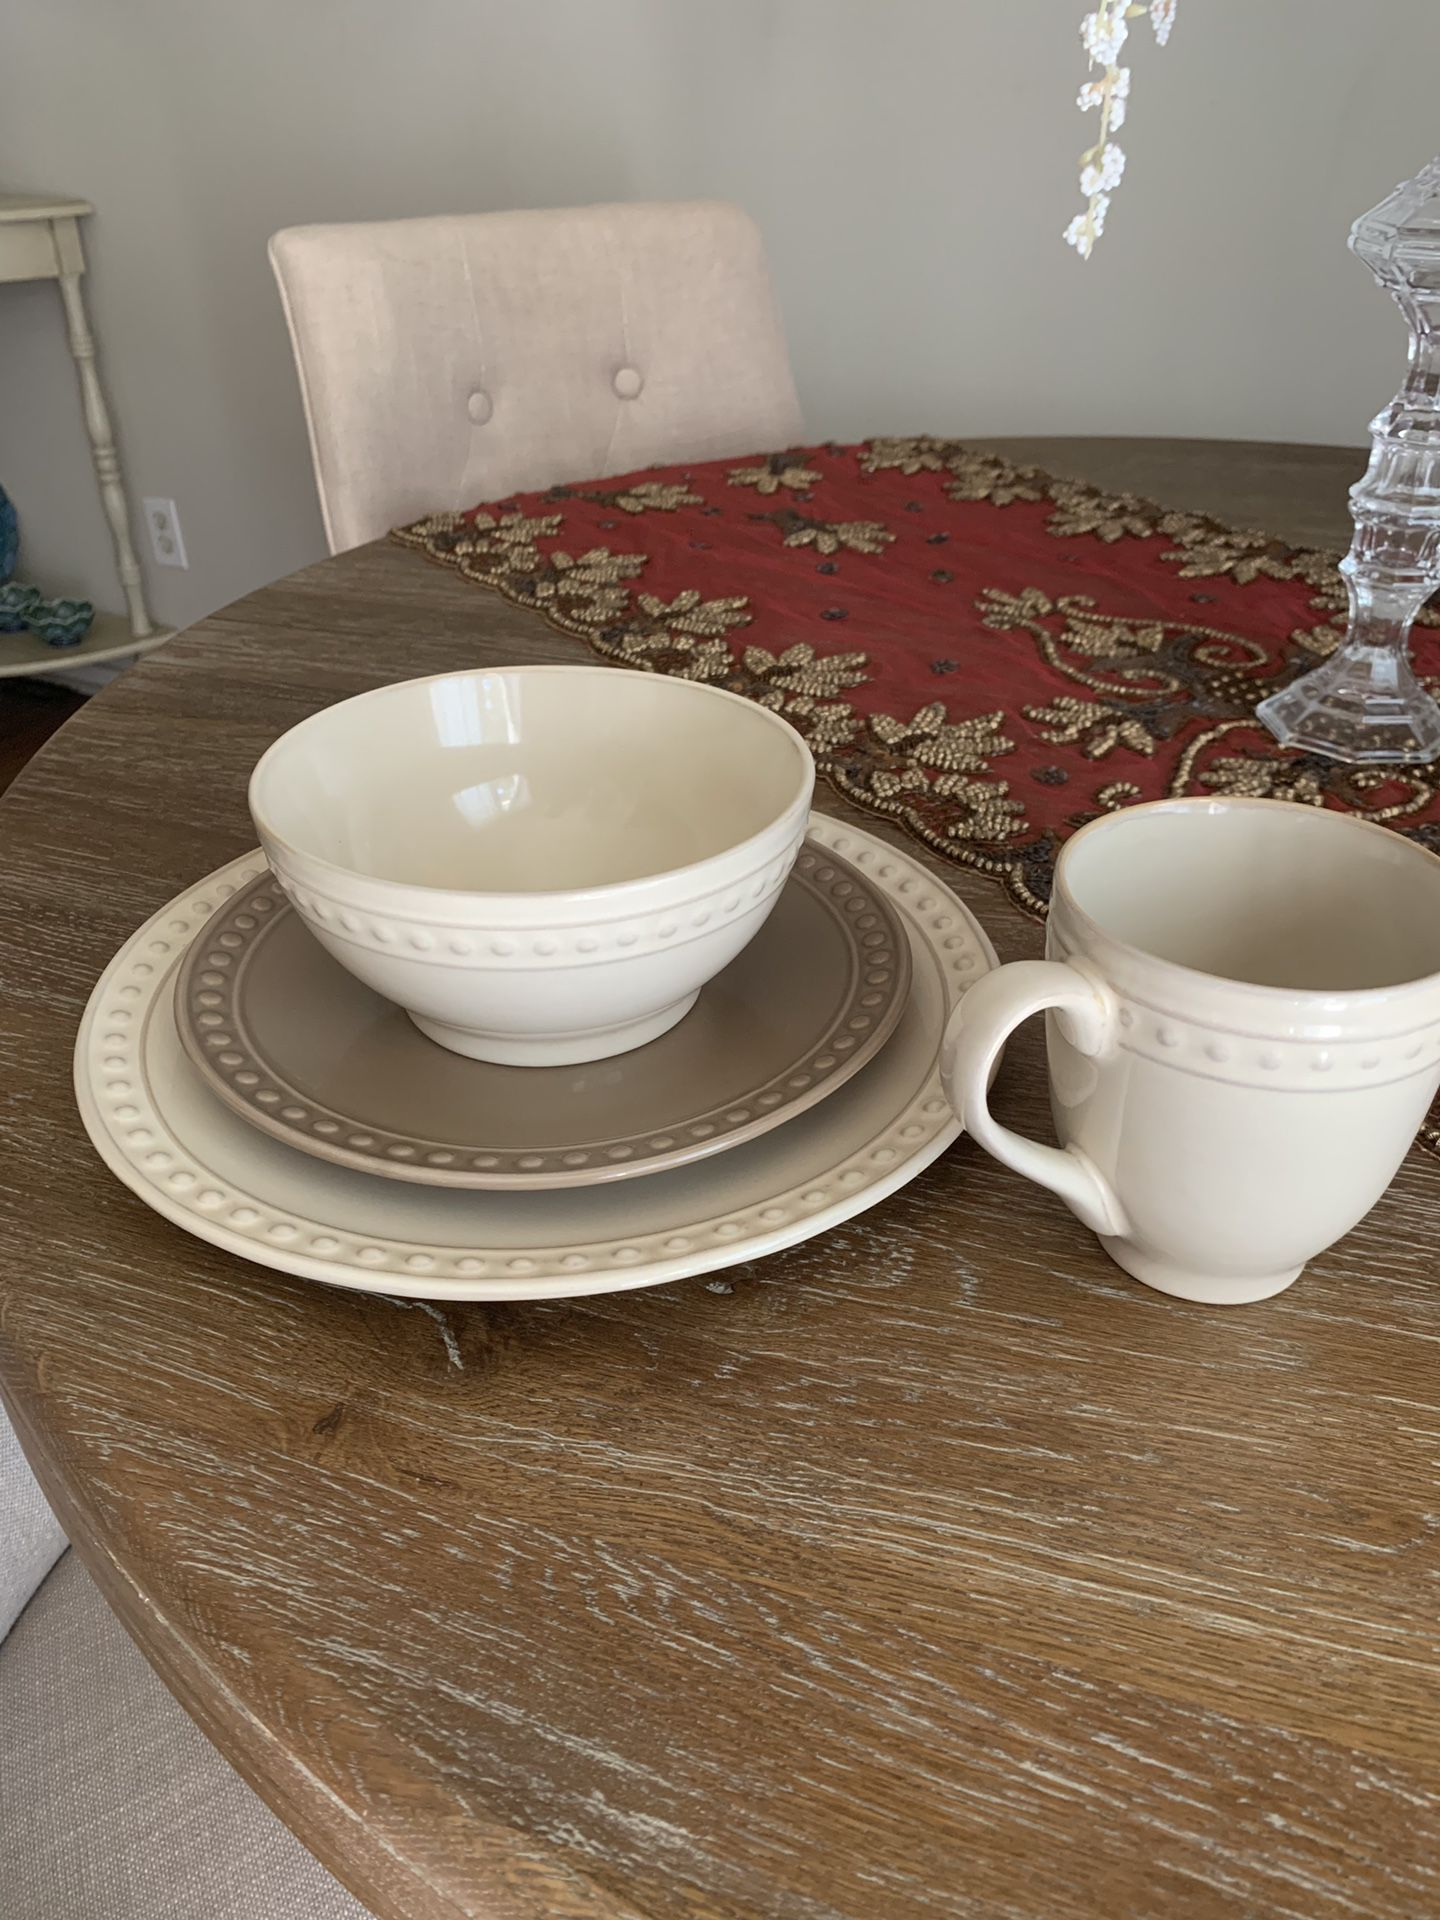 Plates, salad plates, bowls, mugs